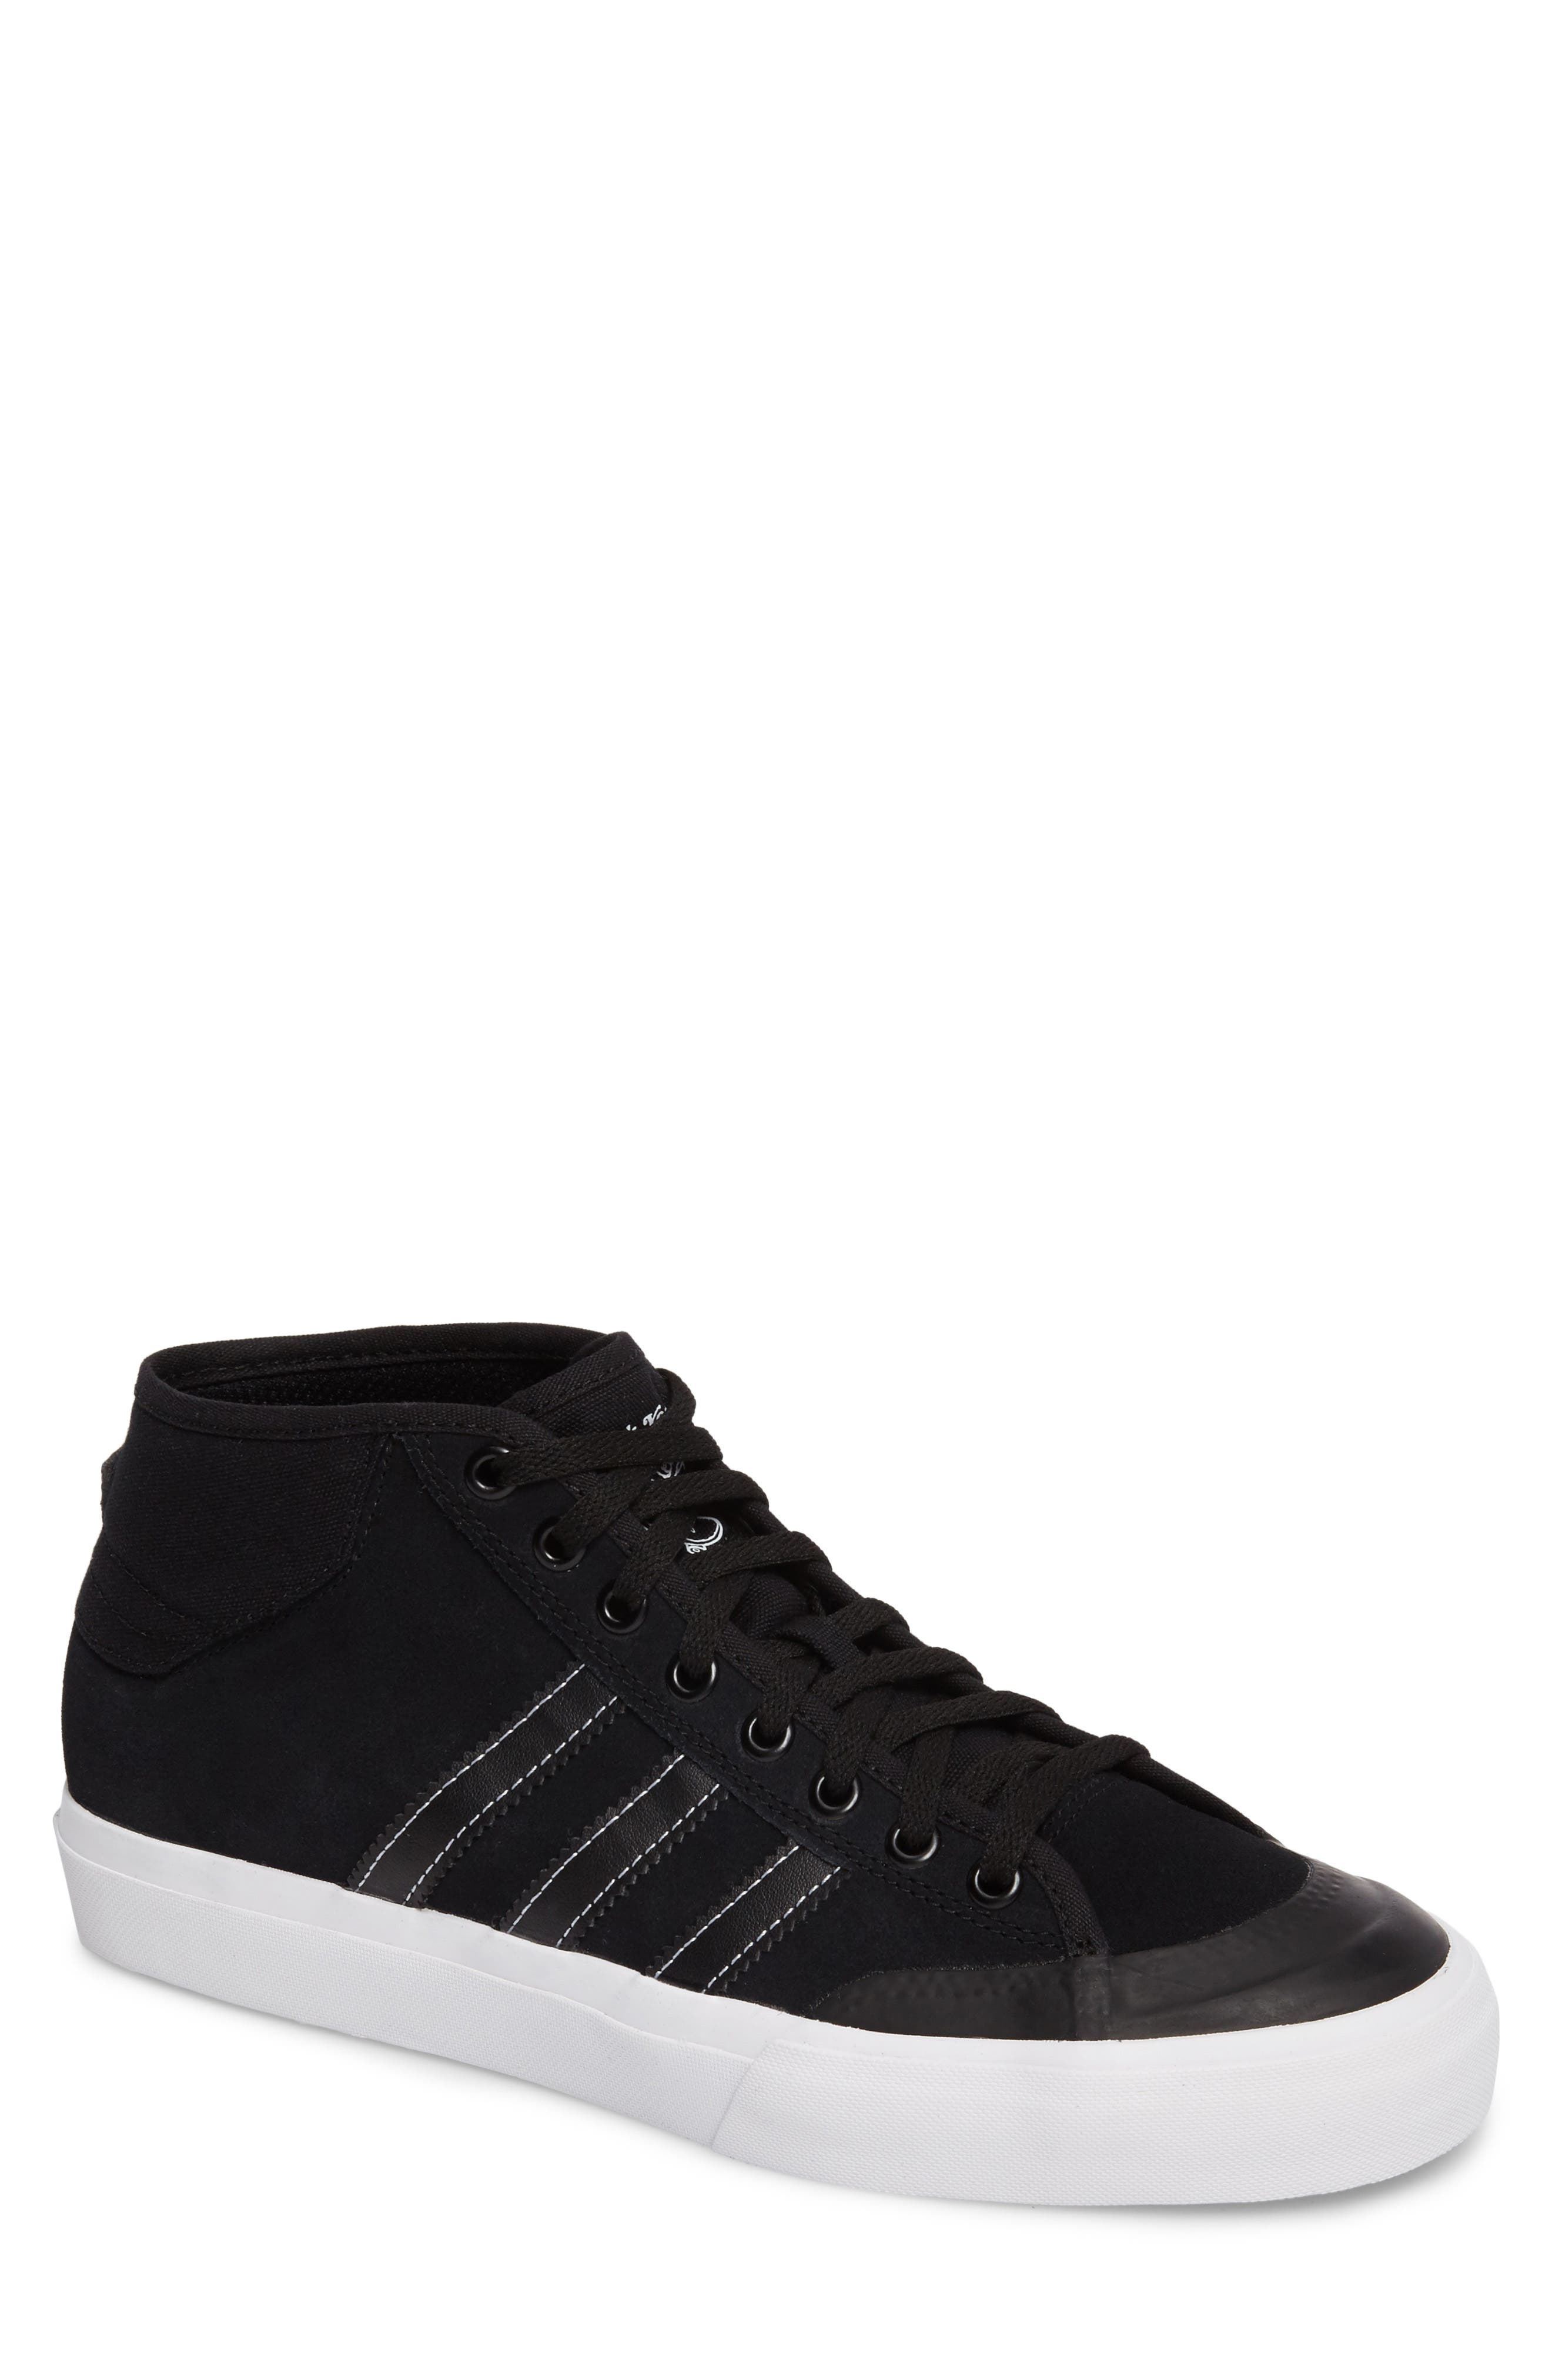 Alternate Image 1 Selected - adidas Matchcourt Mid ADV Sneaker (Men)